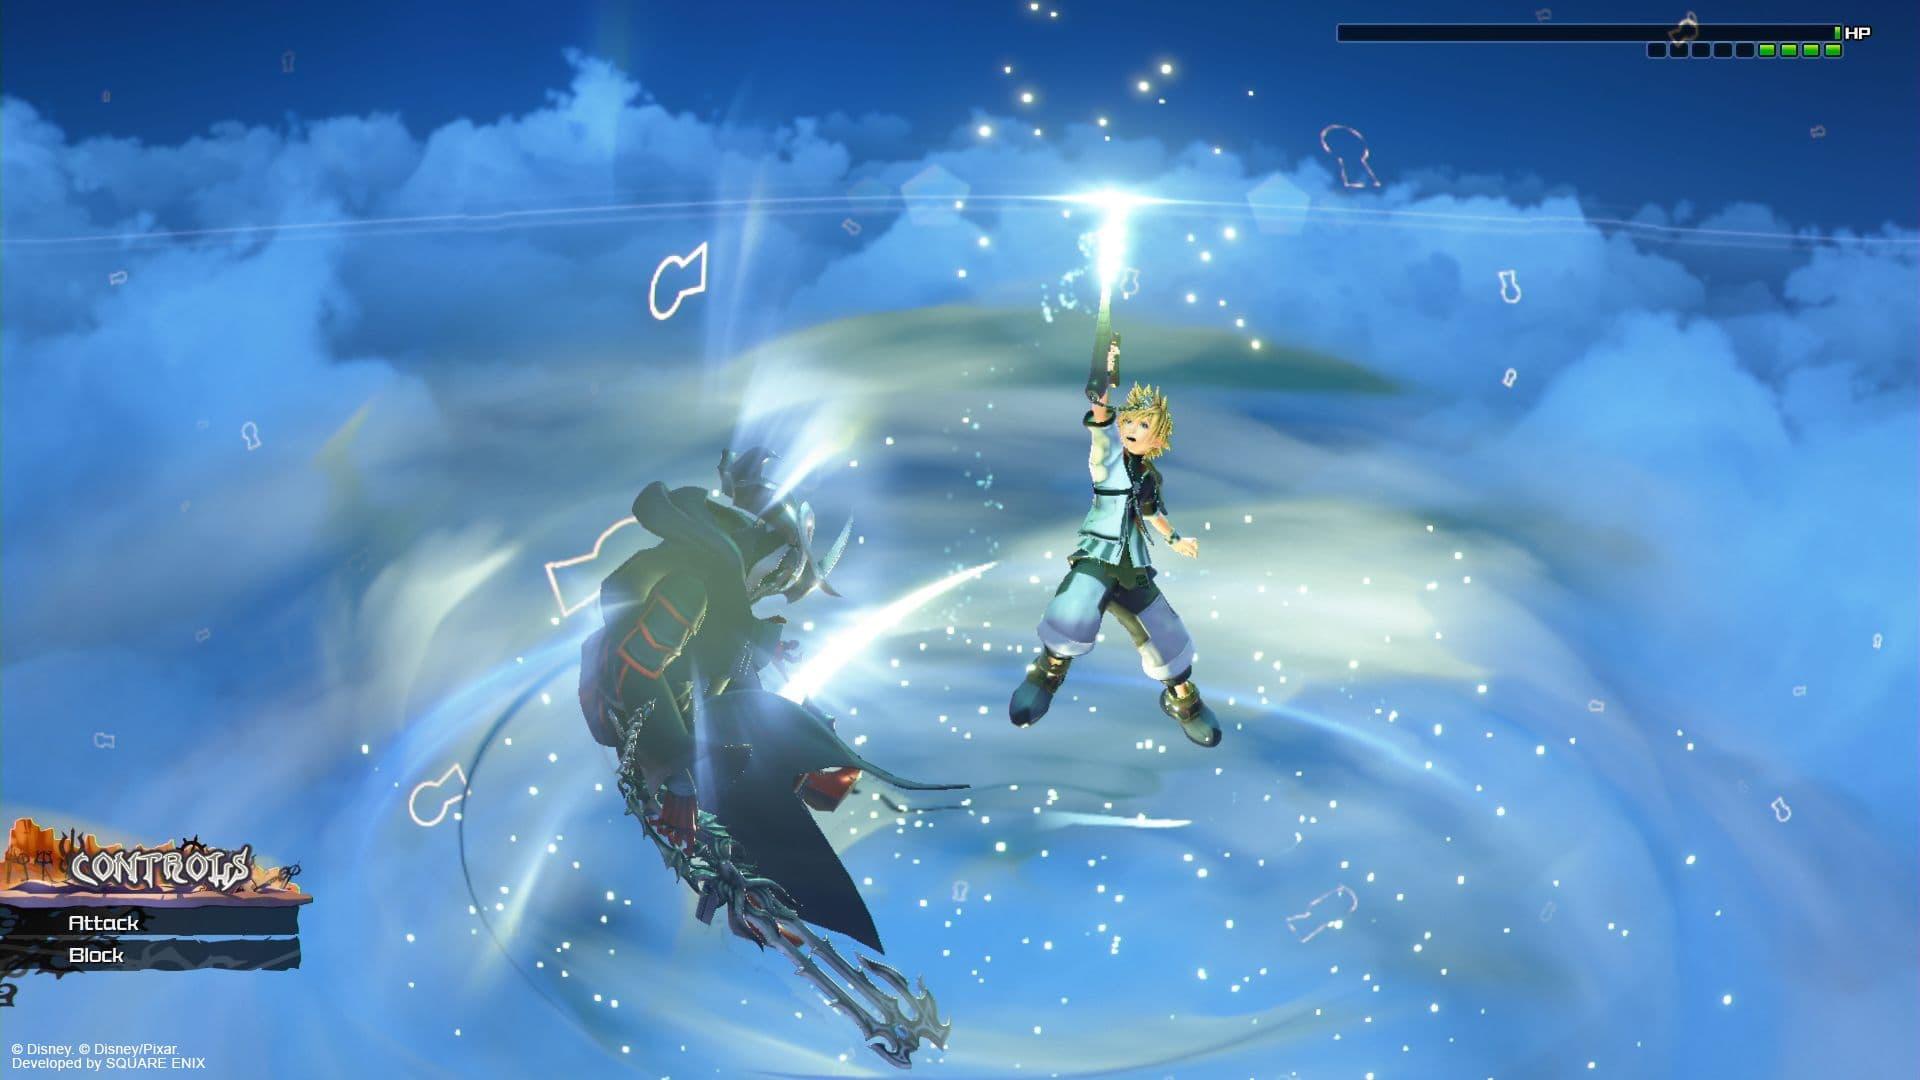 Kingdom Hearts III: ReMIND